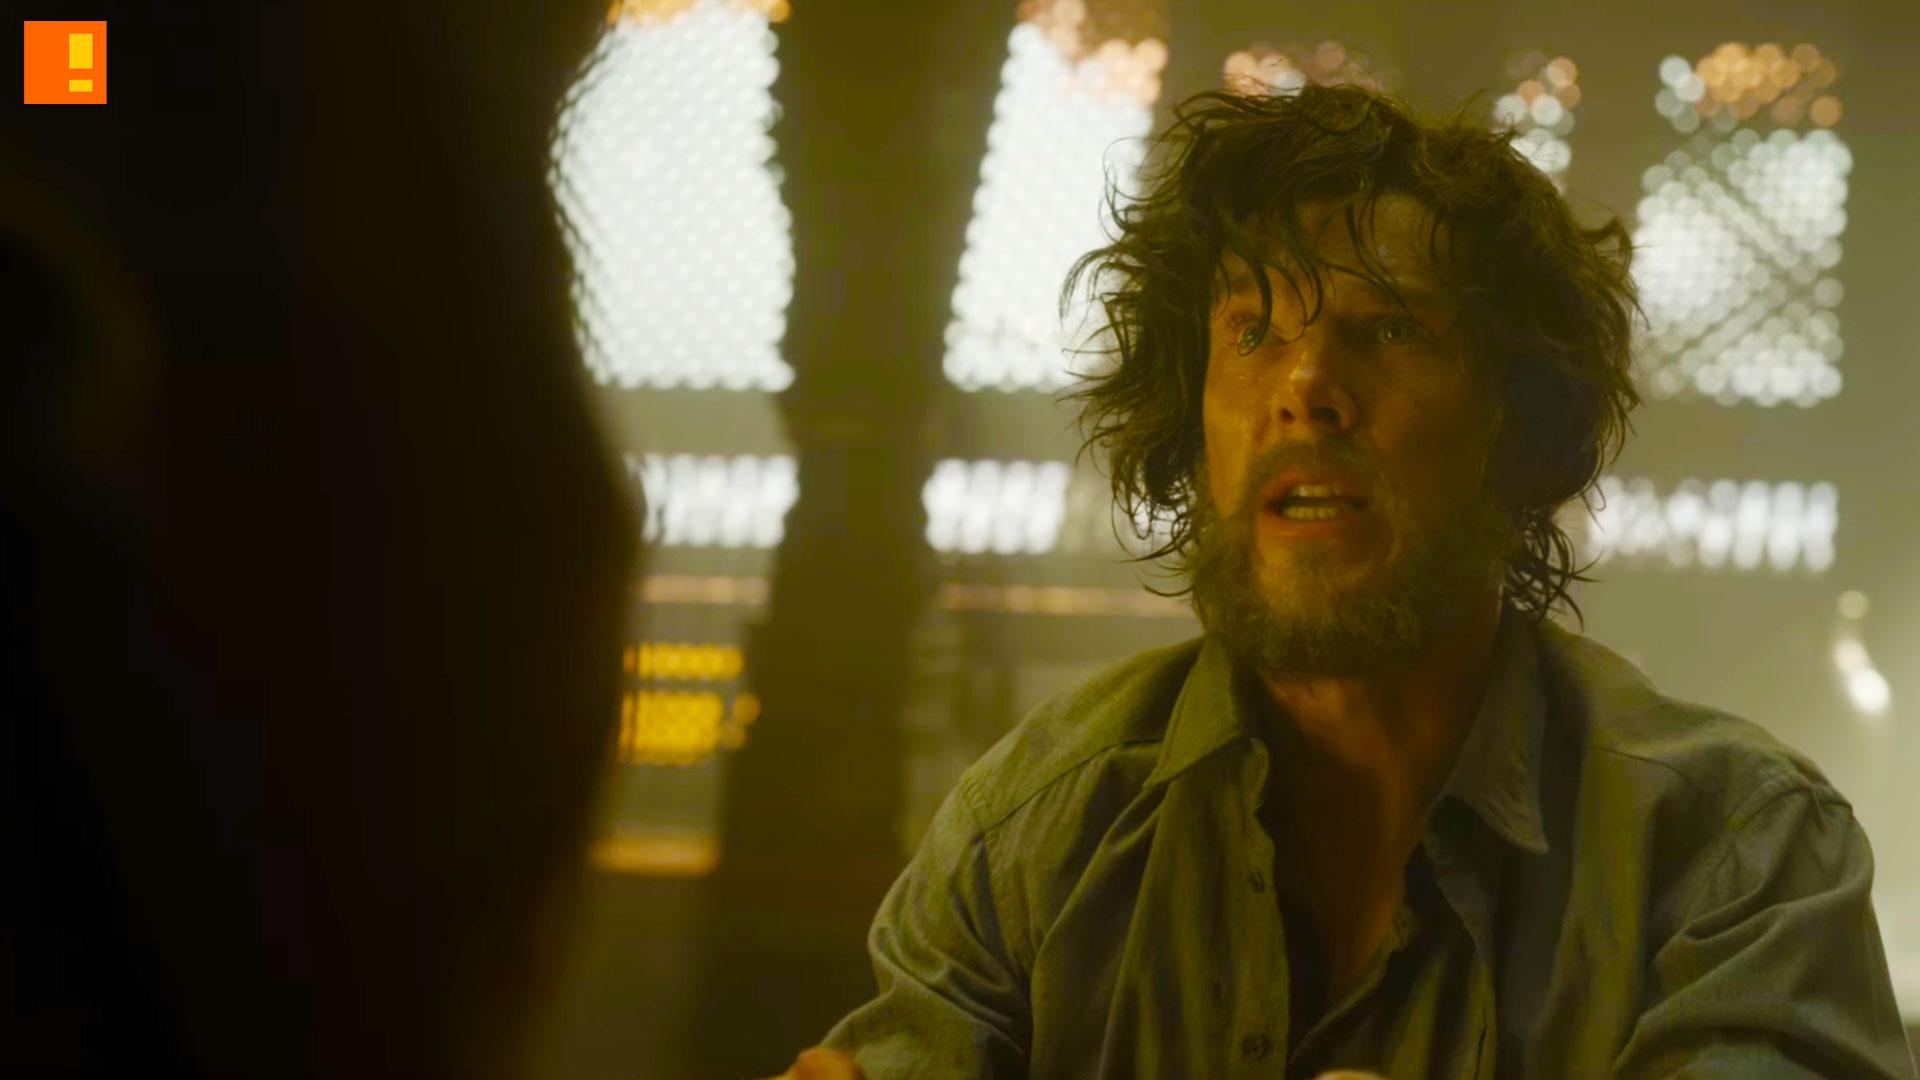 Filme online gratis subtitrate in romana cu cowboy